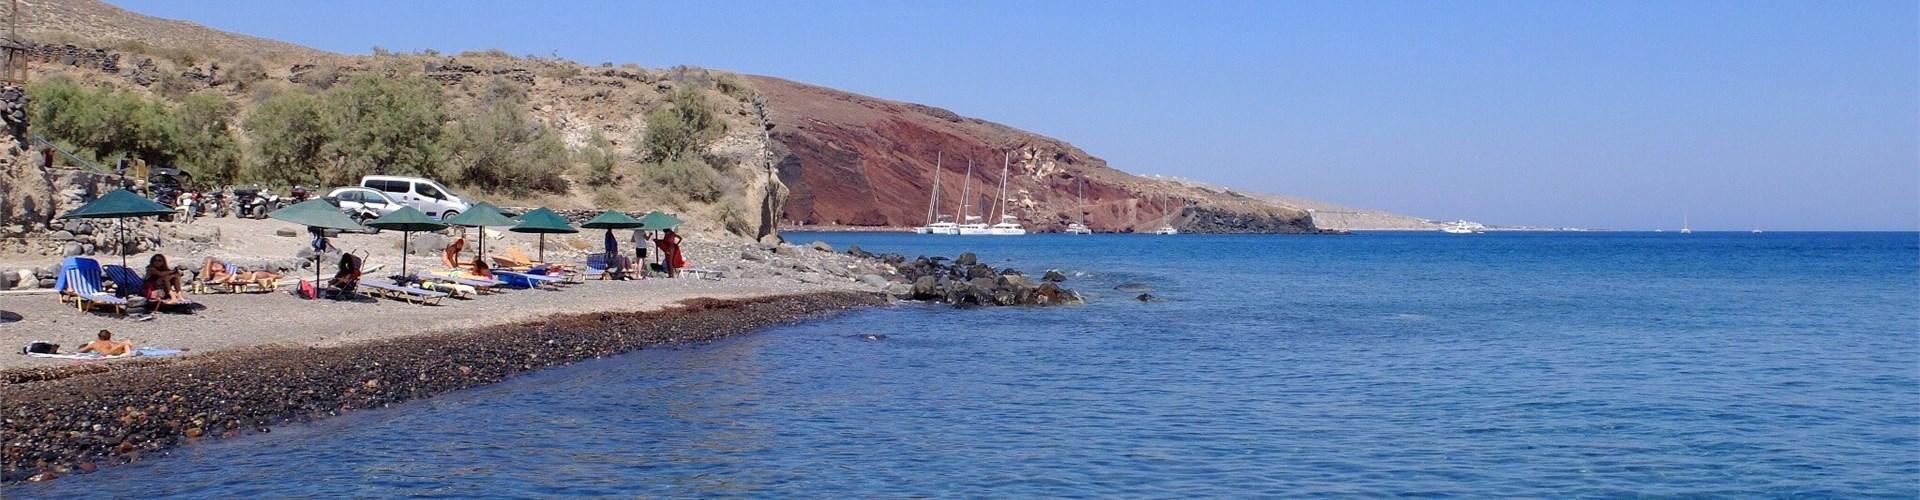 Kambia Beach - Beaches - Santorini